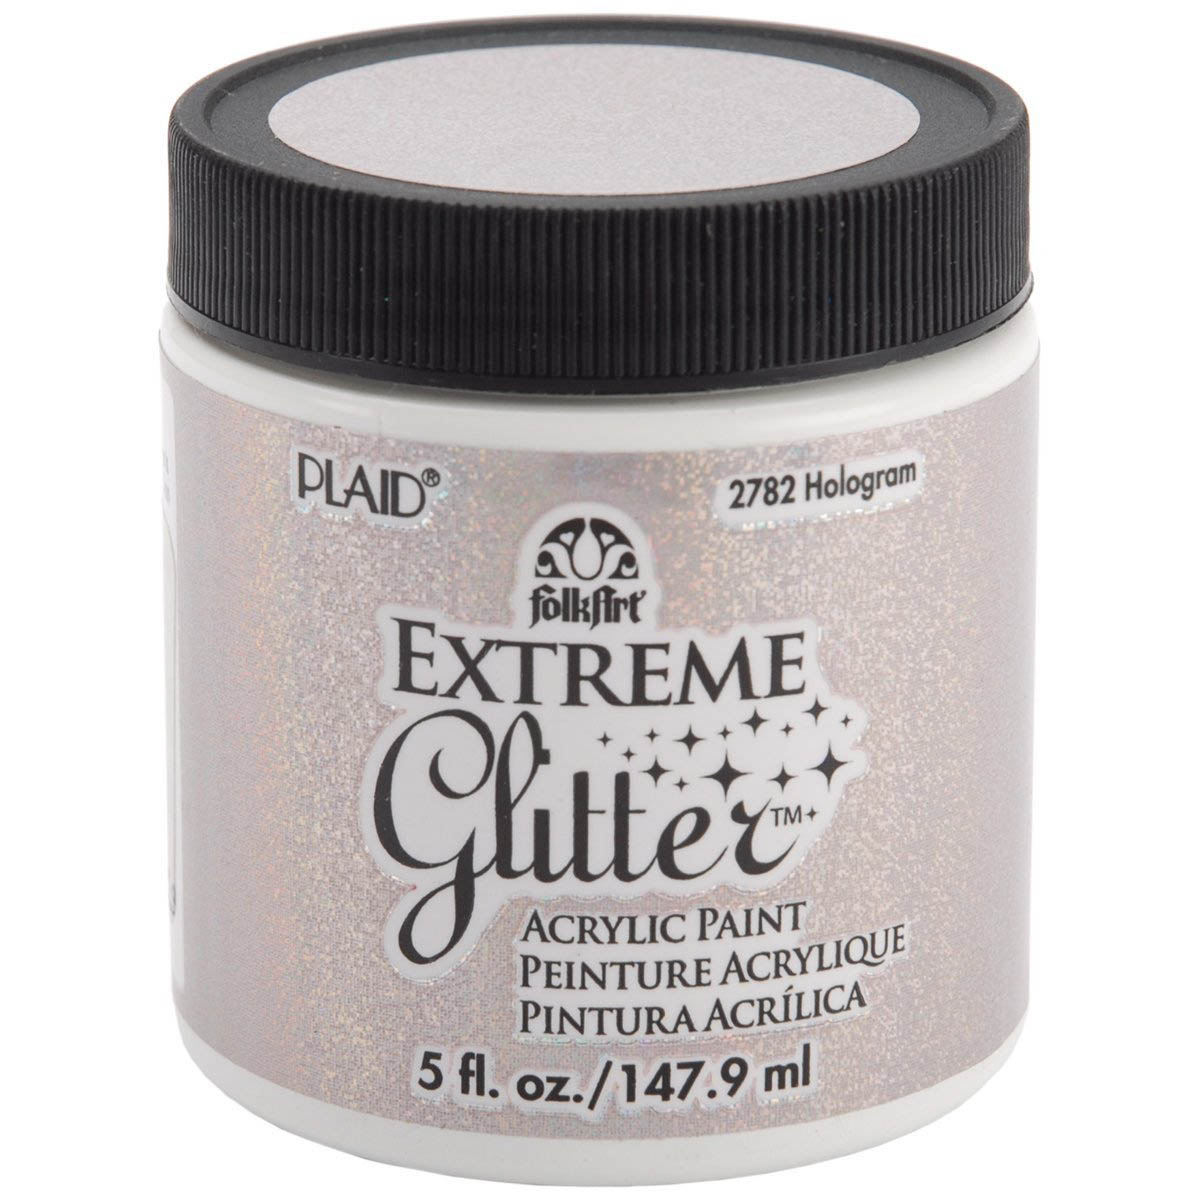 FolkArt ® Extreme Glitter™ - Hologram, 5 oz.